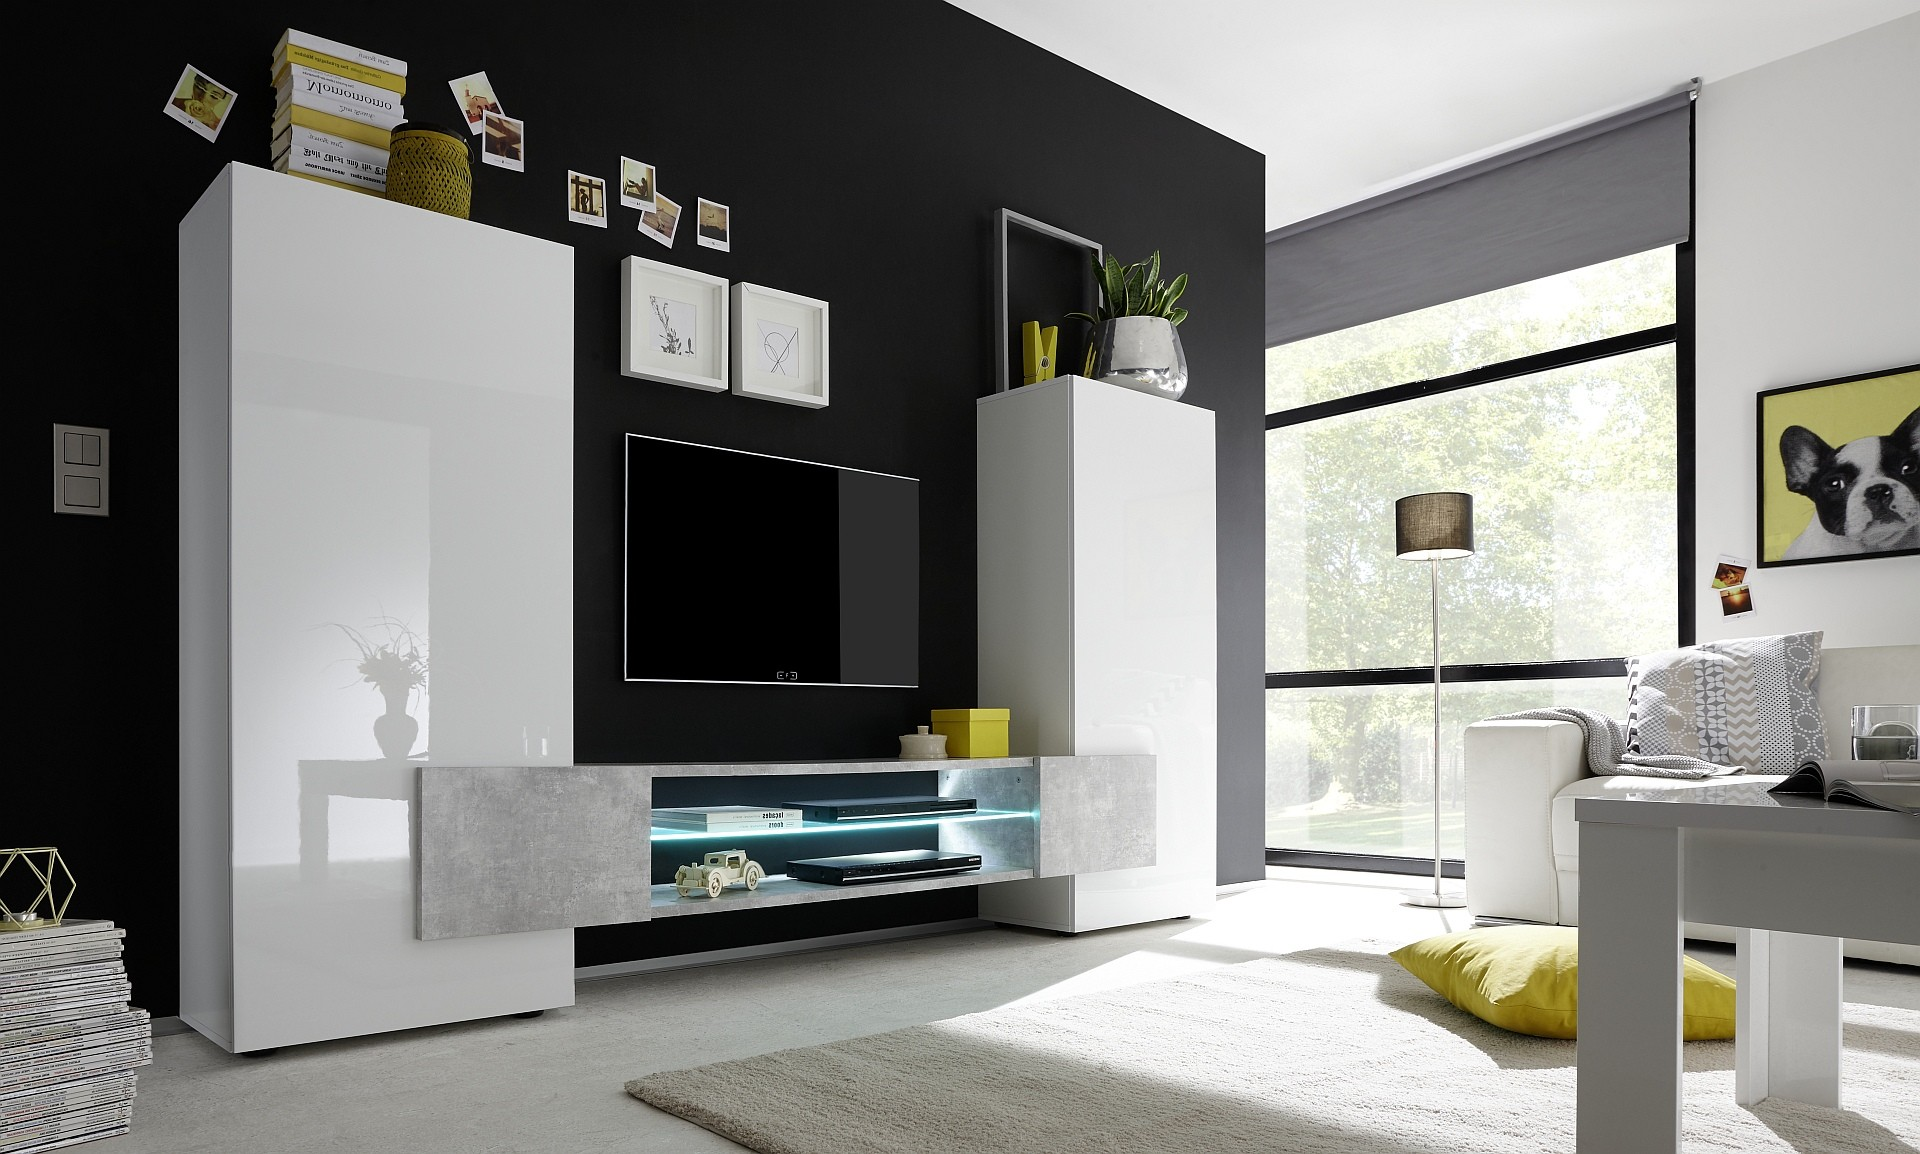 Incastro Iii Modern Tv Wall Set In White And Stone Imitation  # Meuble Tv Ovio